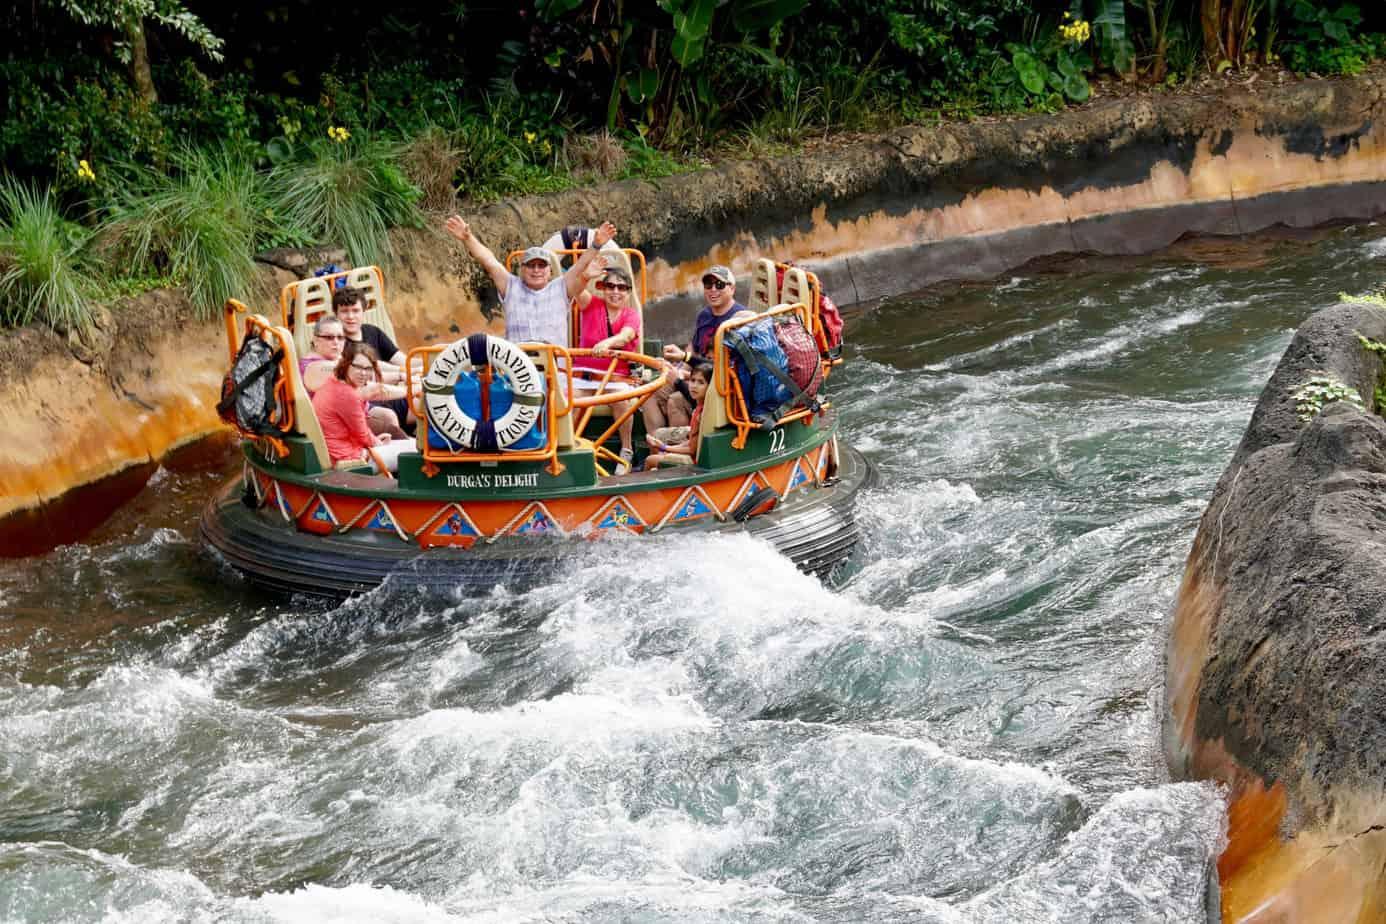 Disney World Thrill Ride - Kali River Rapids